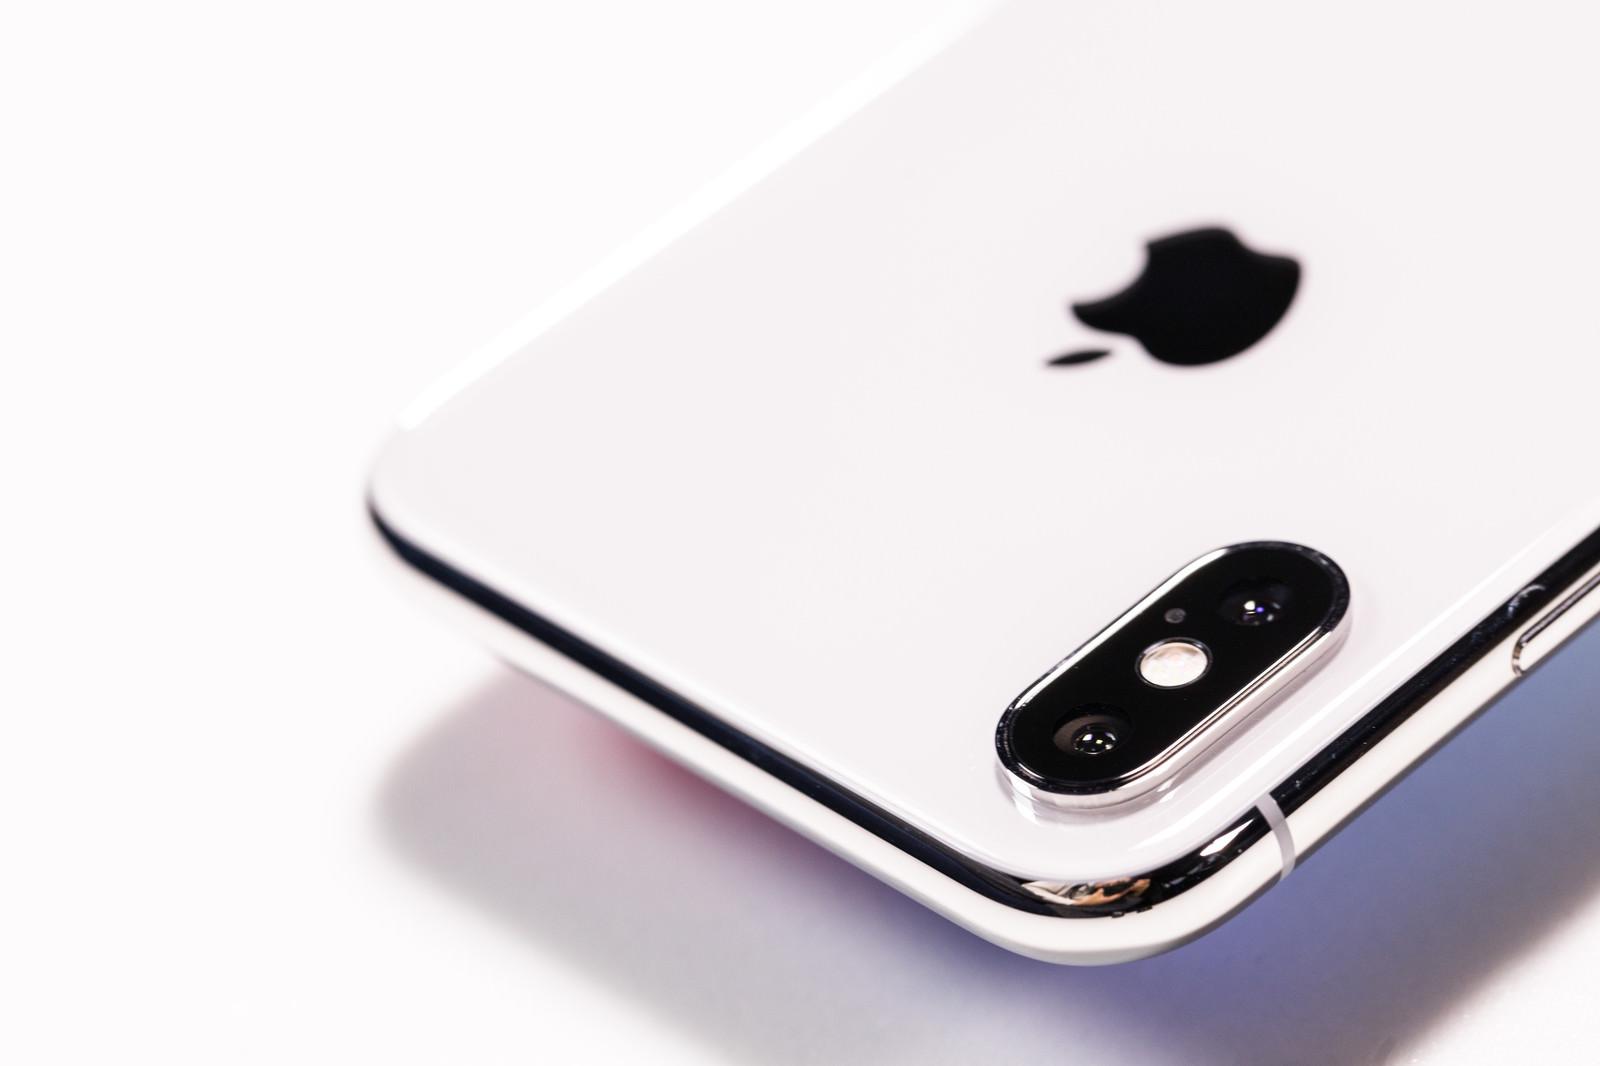 「iPhone X のデュアルレンズカメラ(外カメラ)」の写真